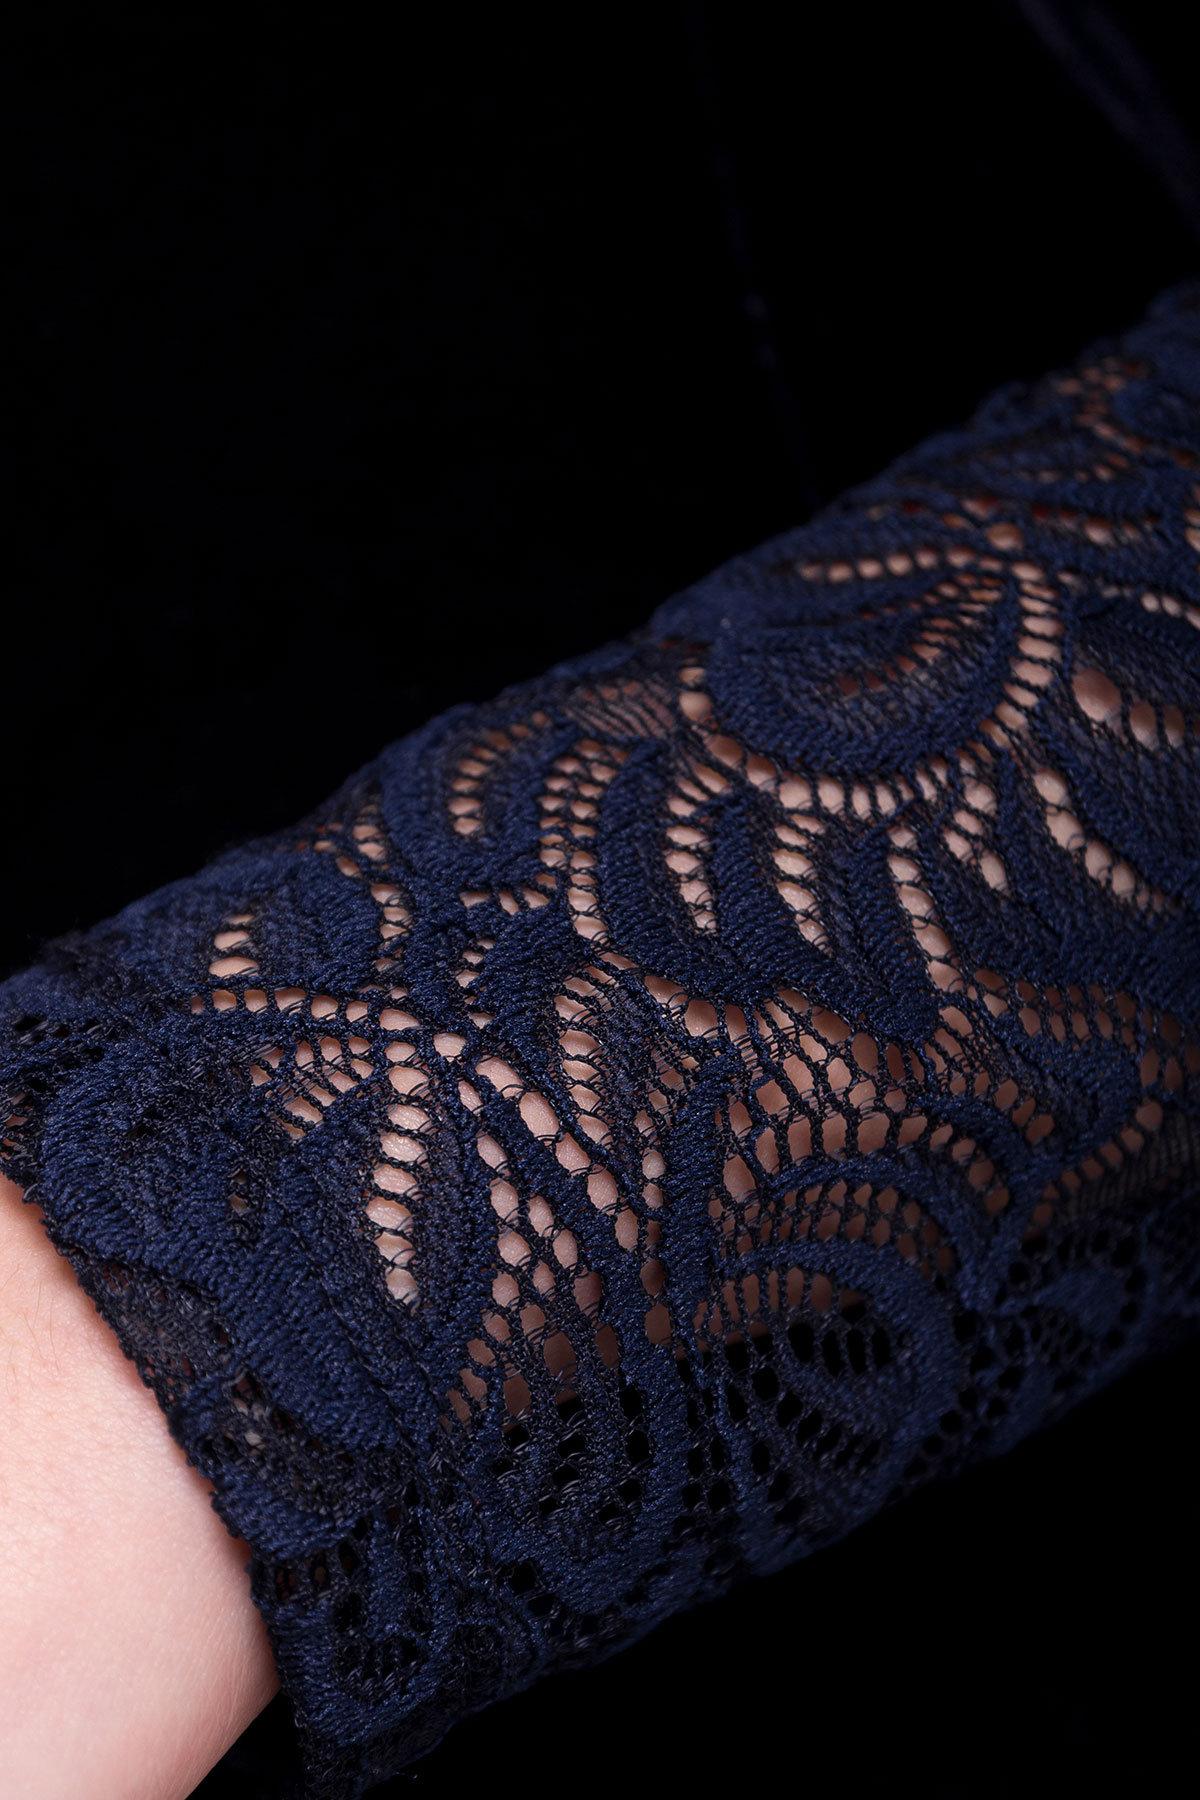 Платье Гоже 4185 АРТ. 20647 Цвет: Темно-синий - фото 4, интернет магазин tm-modus.ru